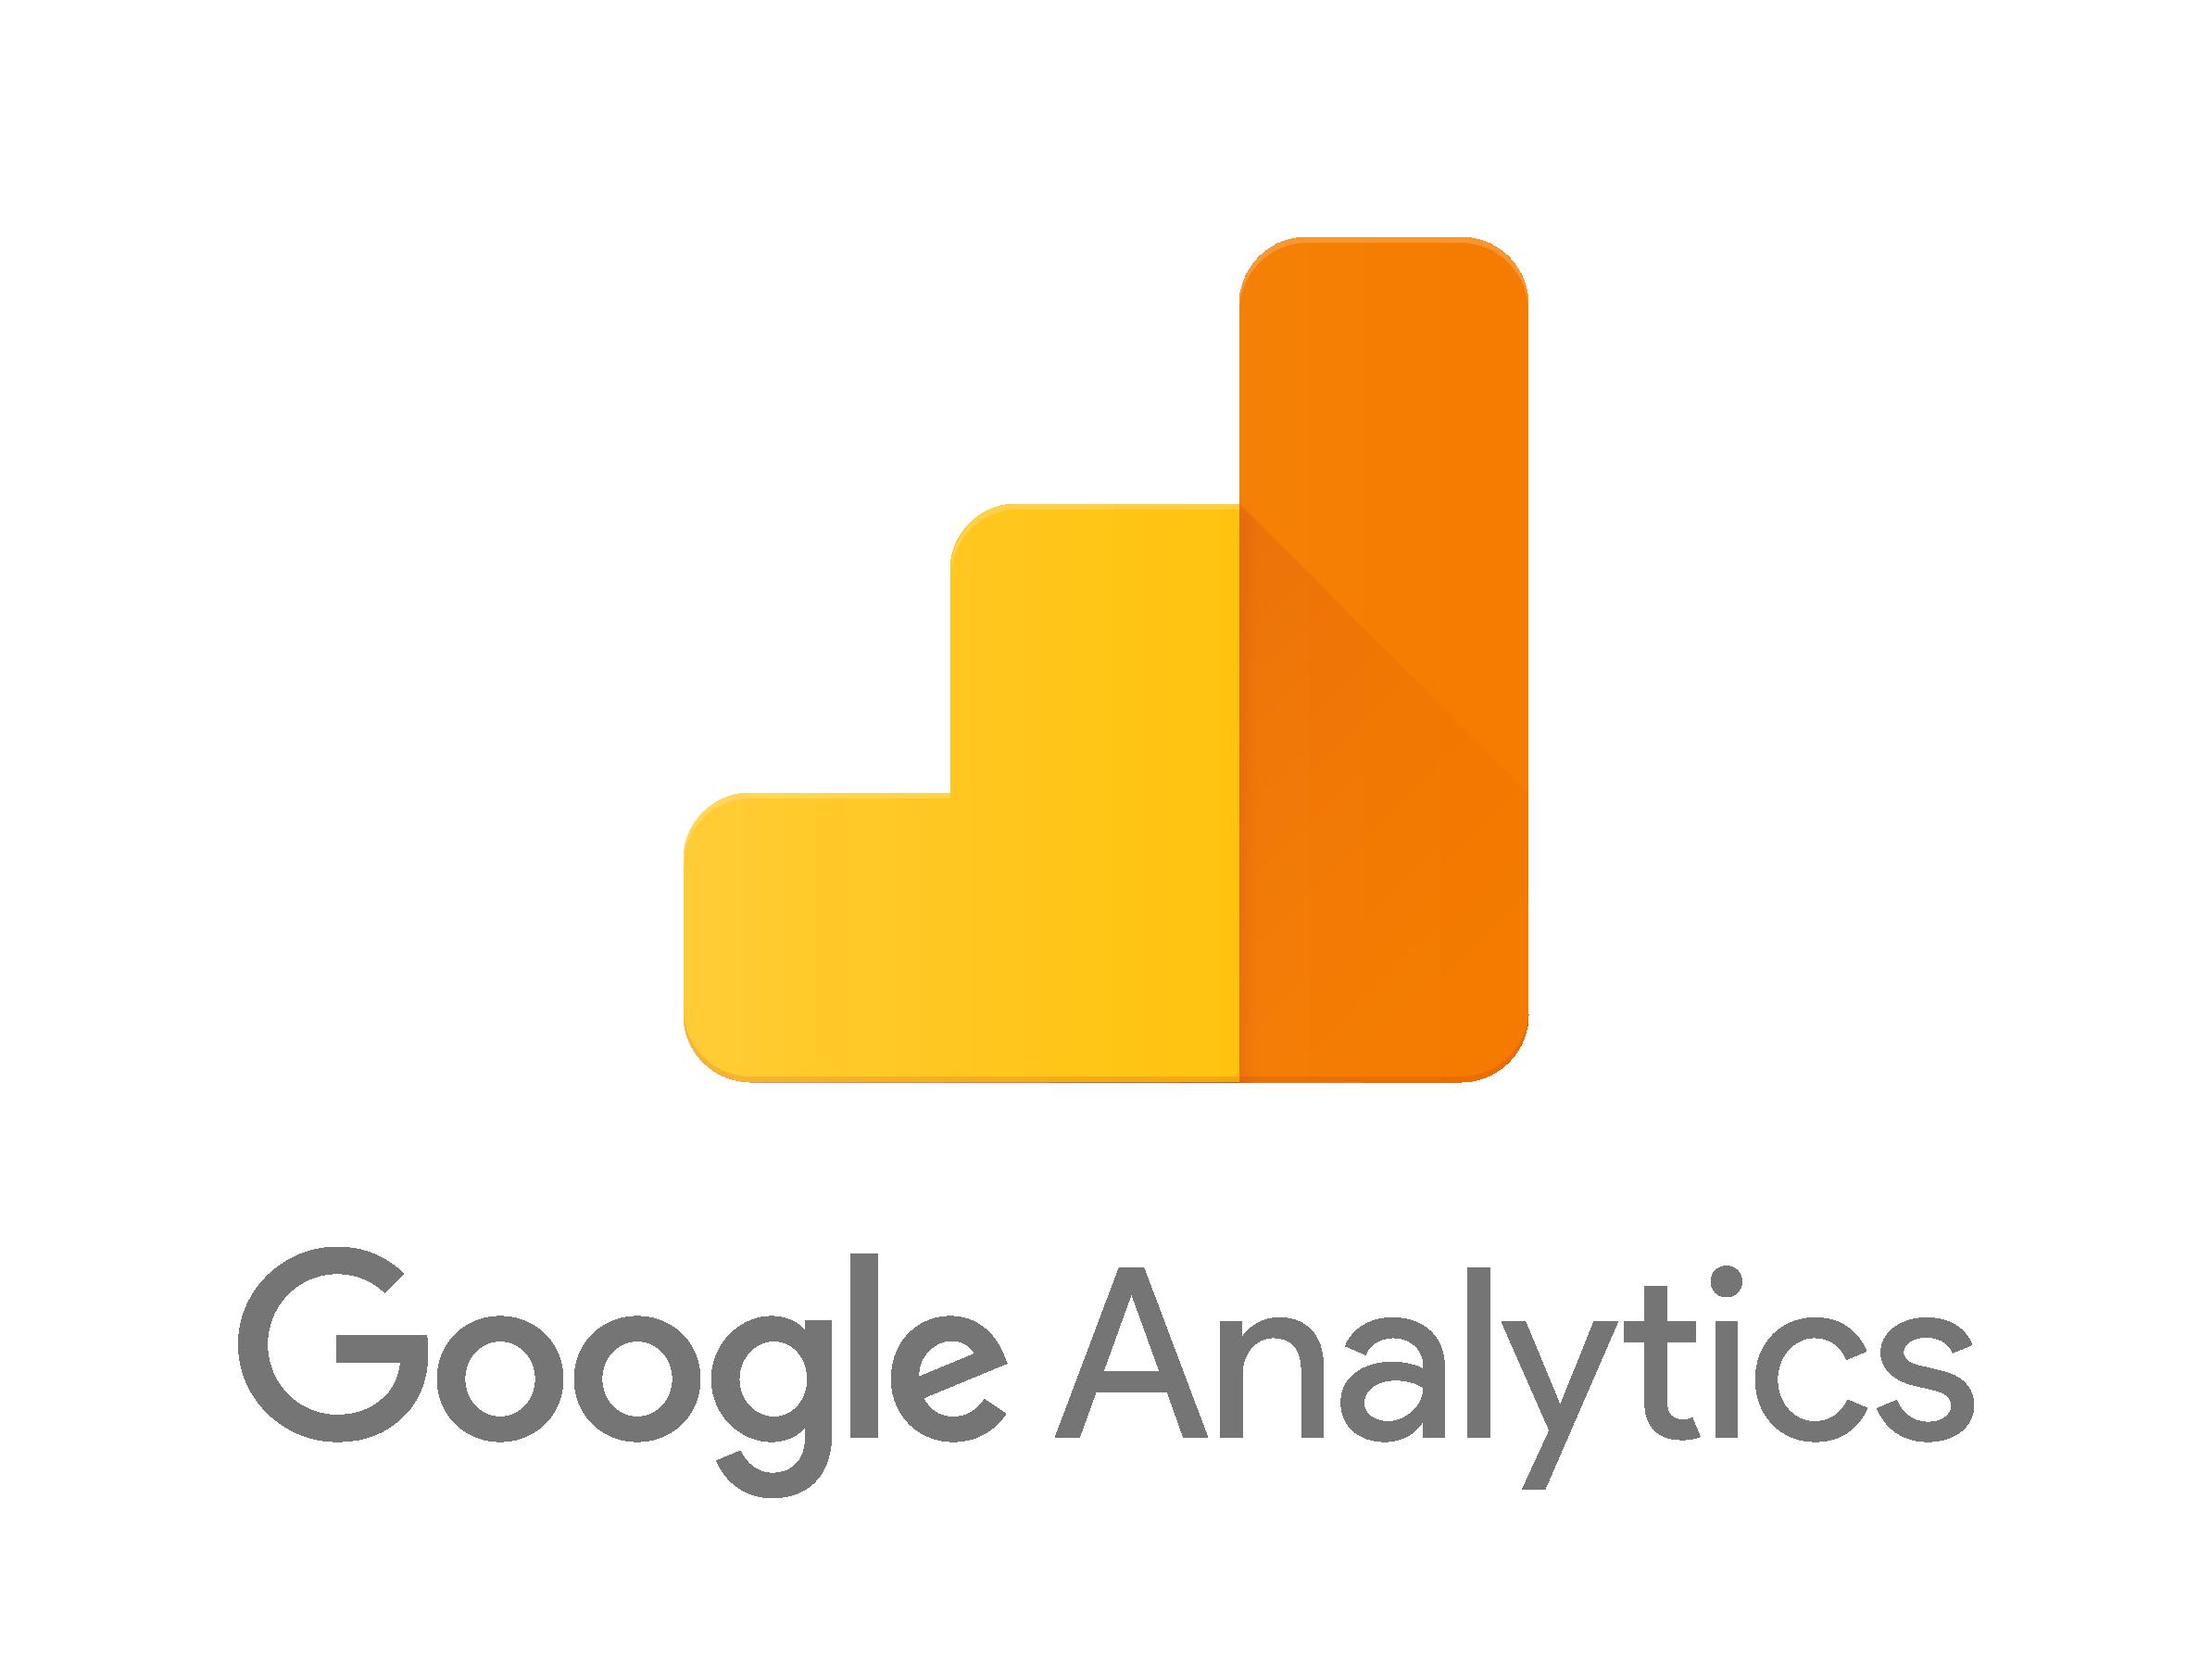 manas-medya-reklam-tasarim-ajansi-bing-reklamlari Arama motoru pazarlaması sem search engine marketing google analytics arama motoru pazarlama